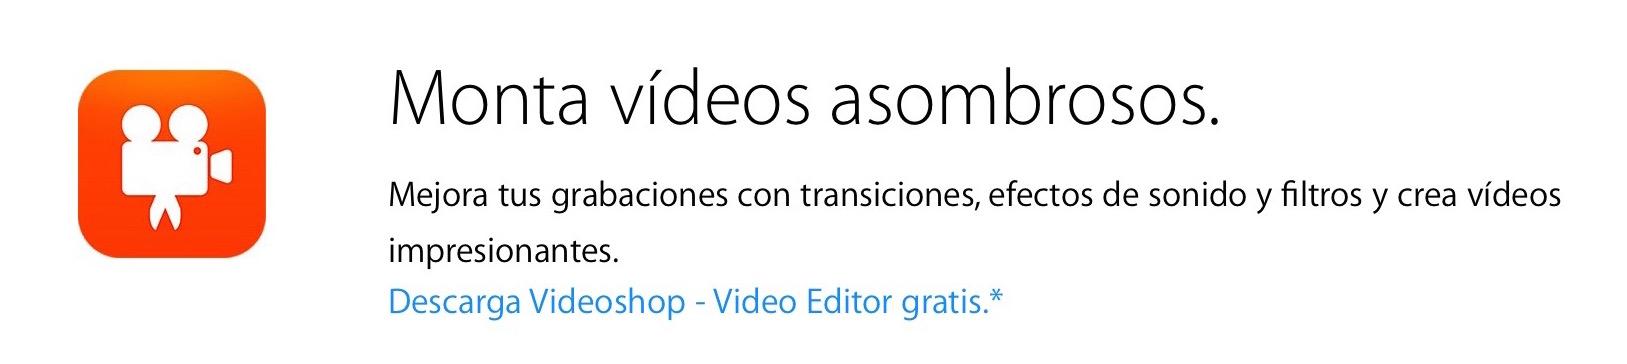 Videoshop oferta